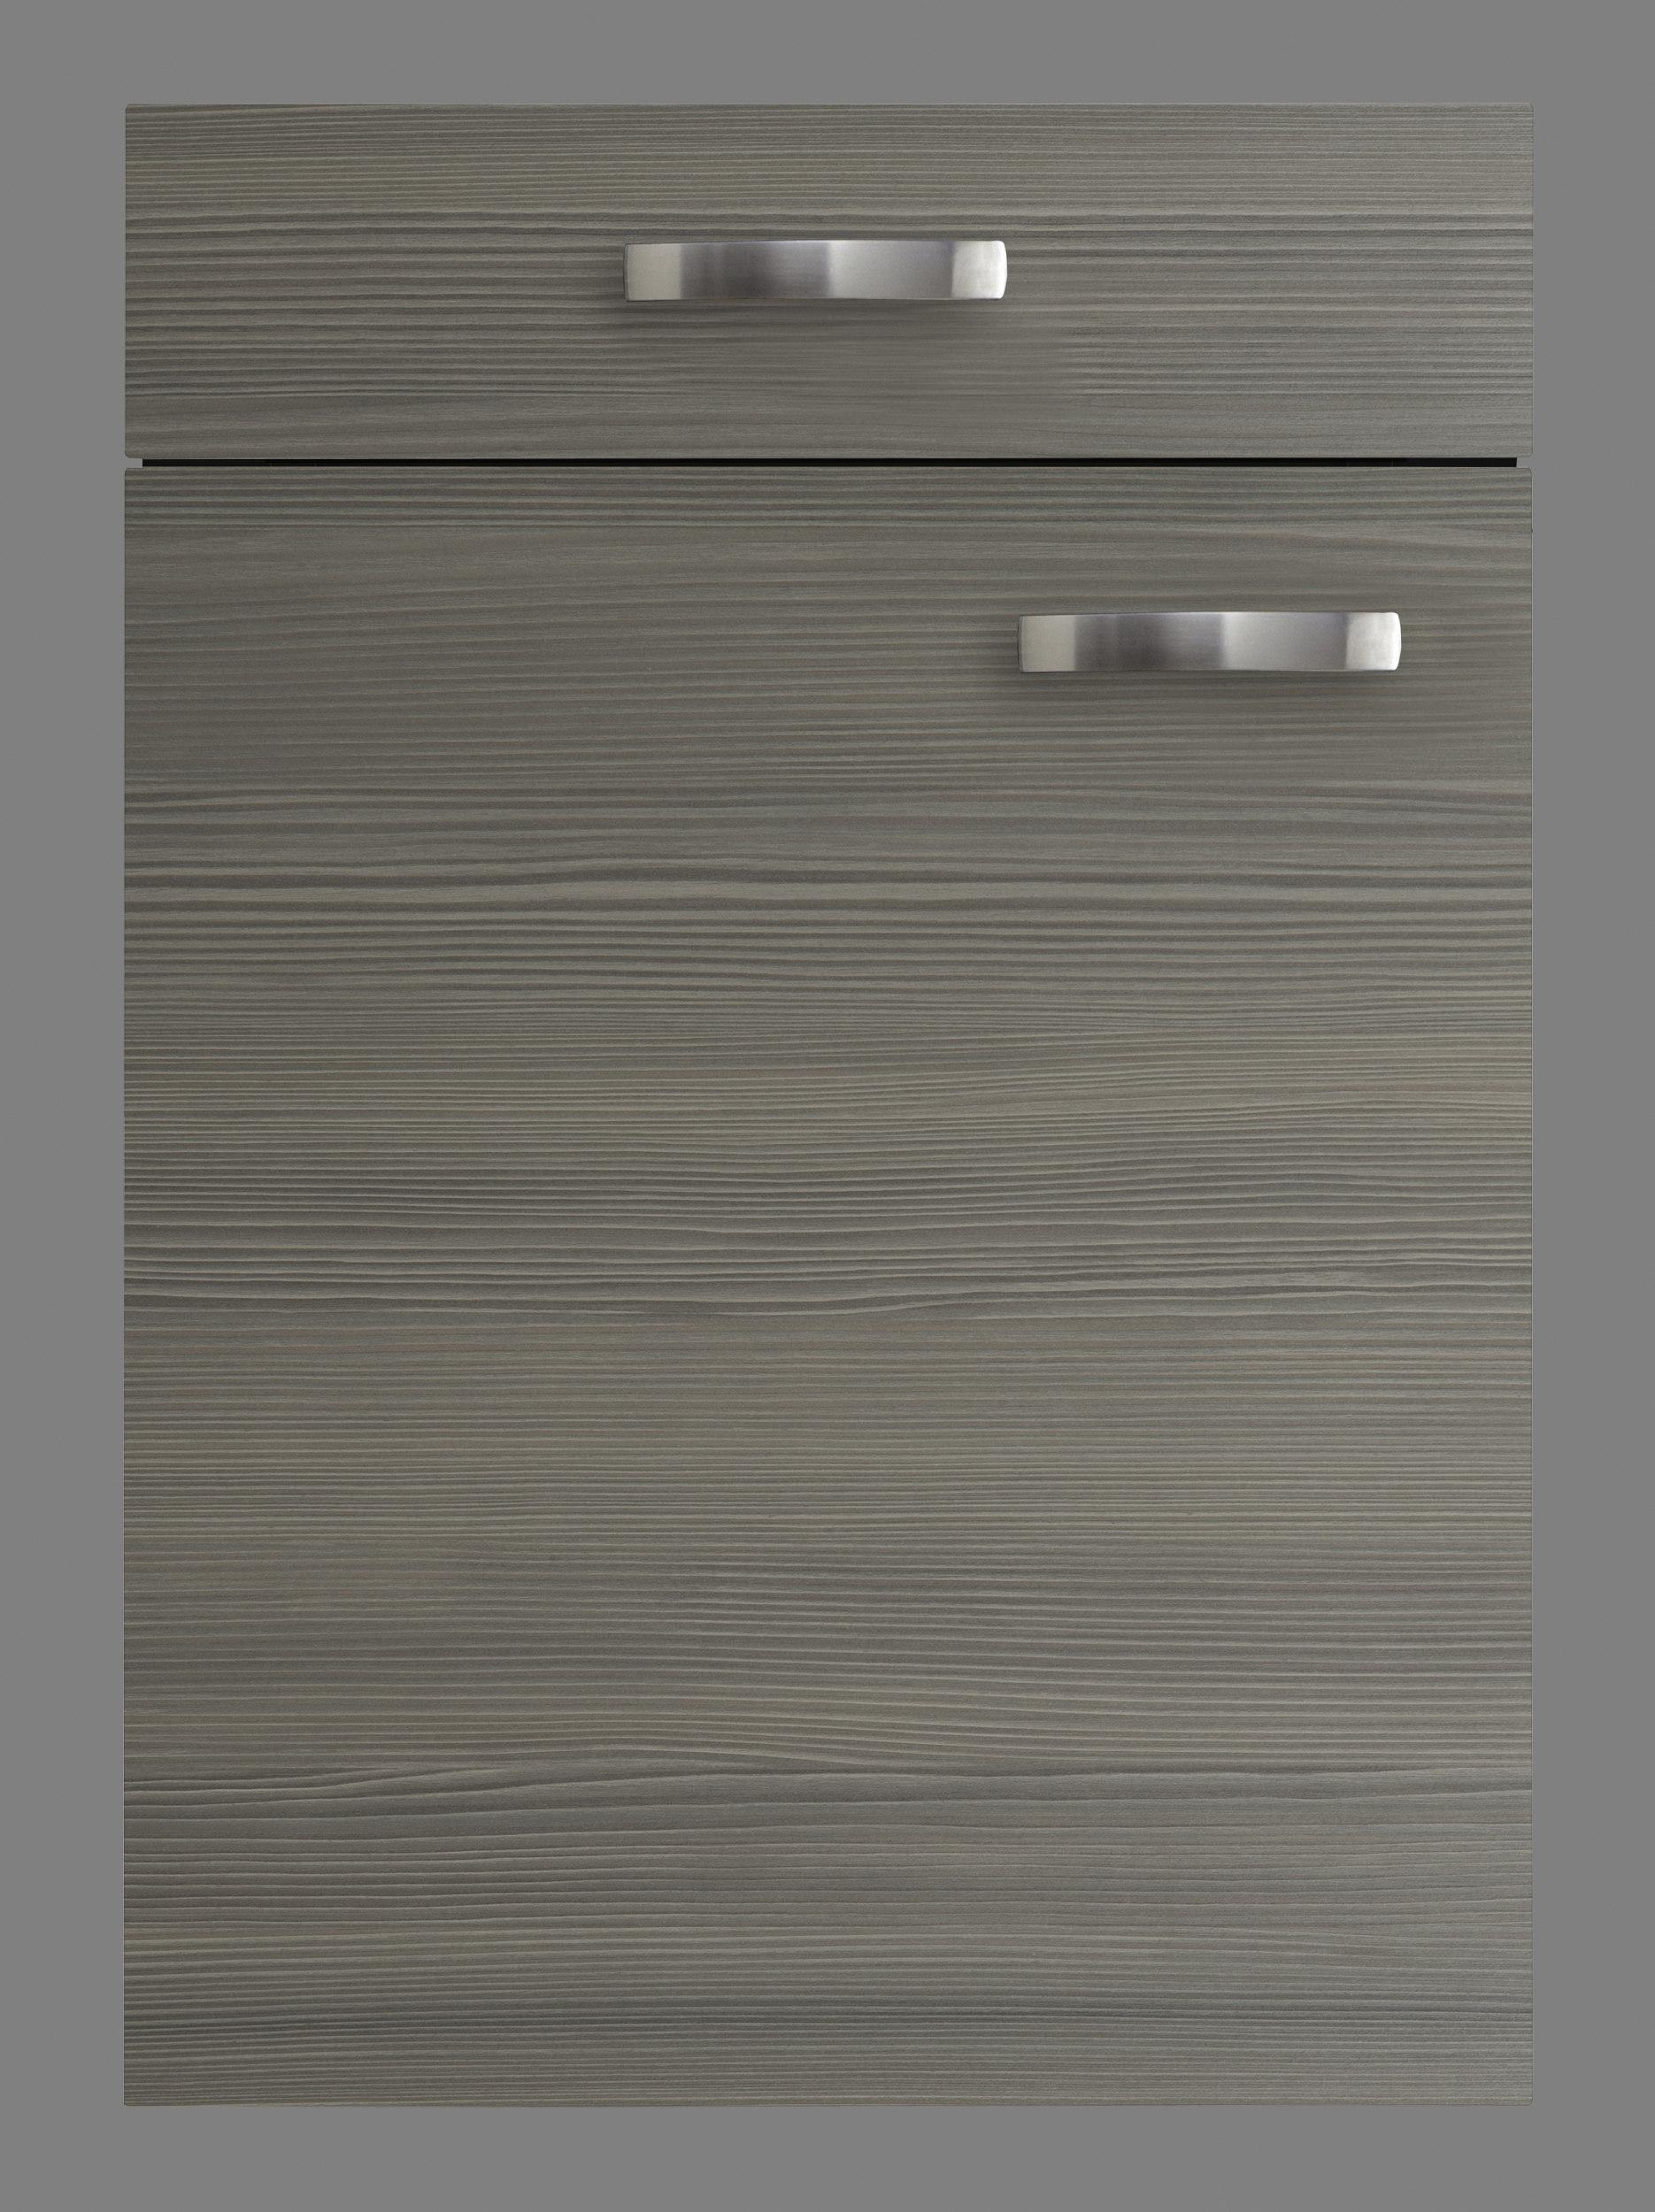 singlek che toledo mit glaskermik kochfeld breite 160. Black Bedroom Furniture Sets. Home Design Ideas